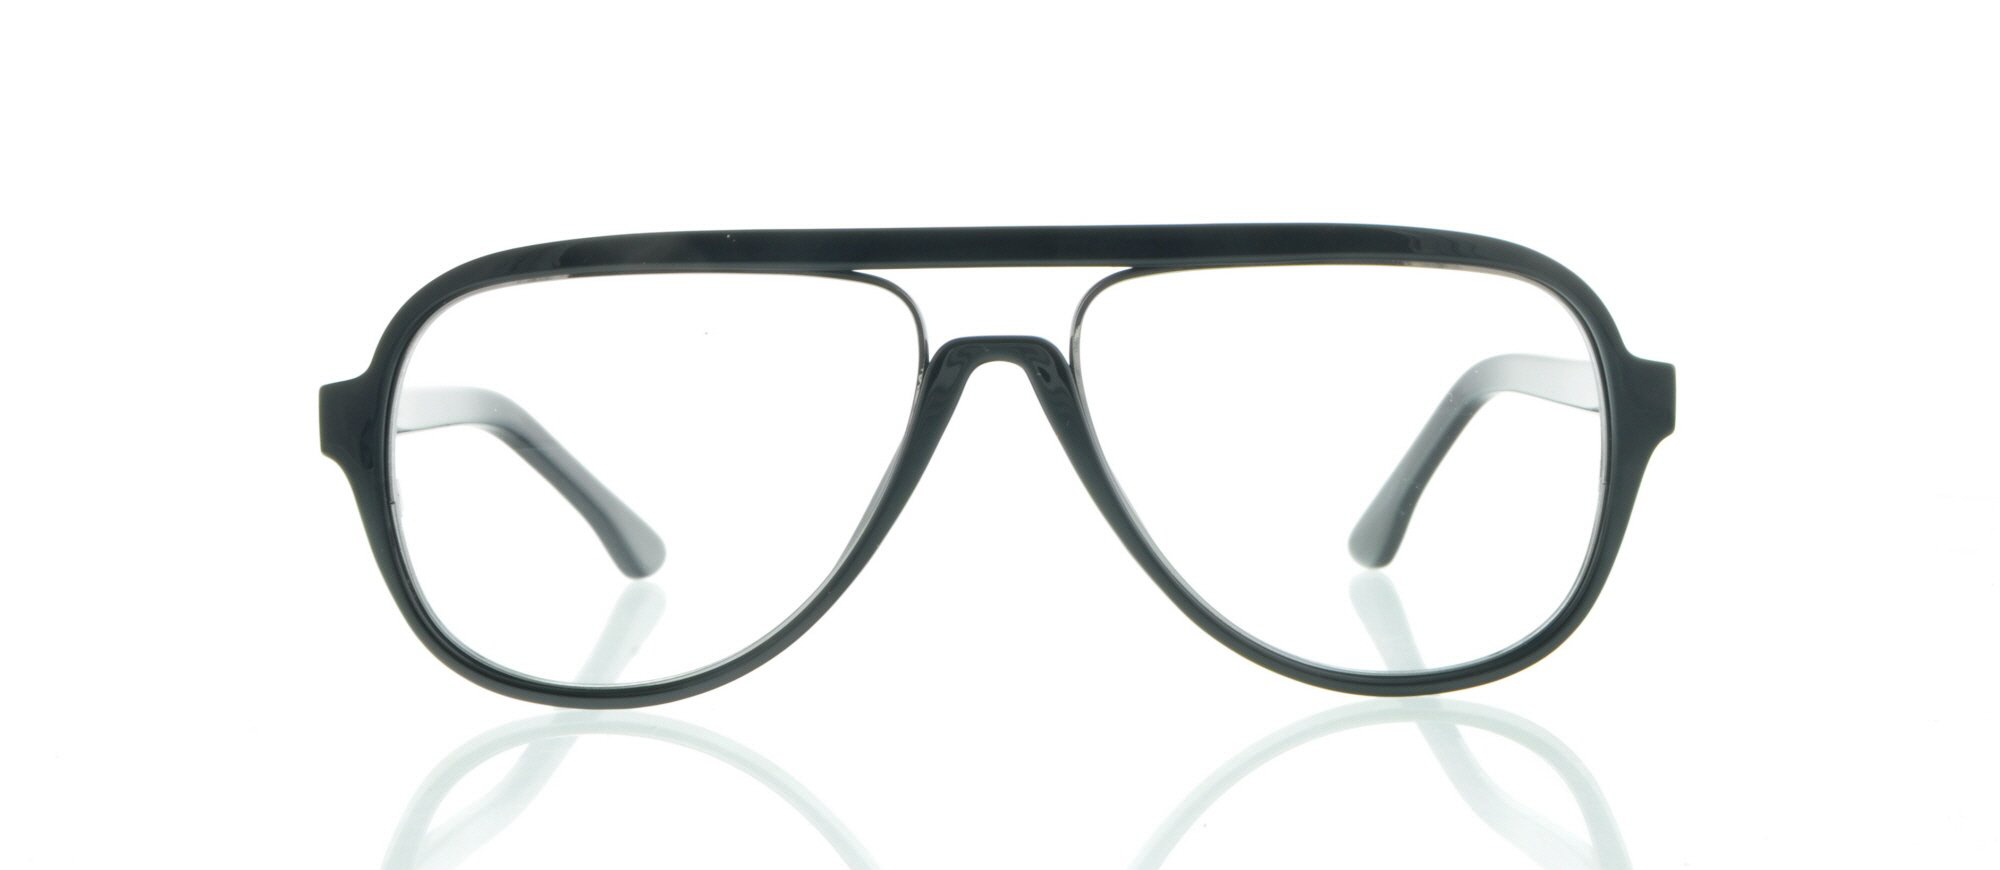 1A-sehen.de Brille 1A-sehen.de 1201 C2 schwarz/silber btnoAfF